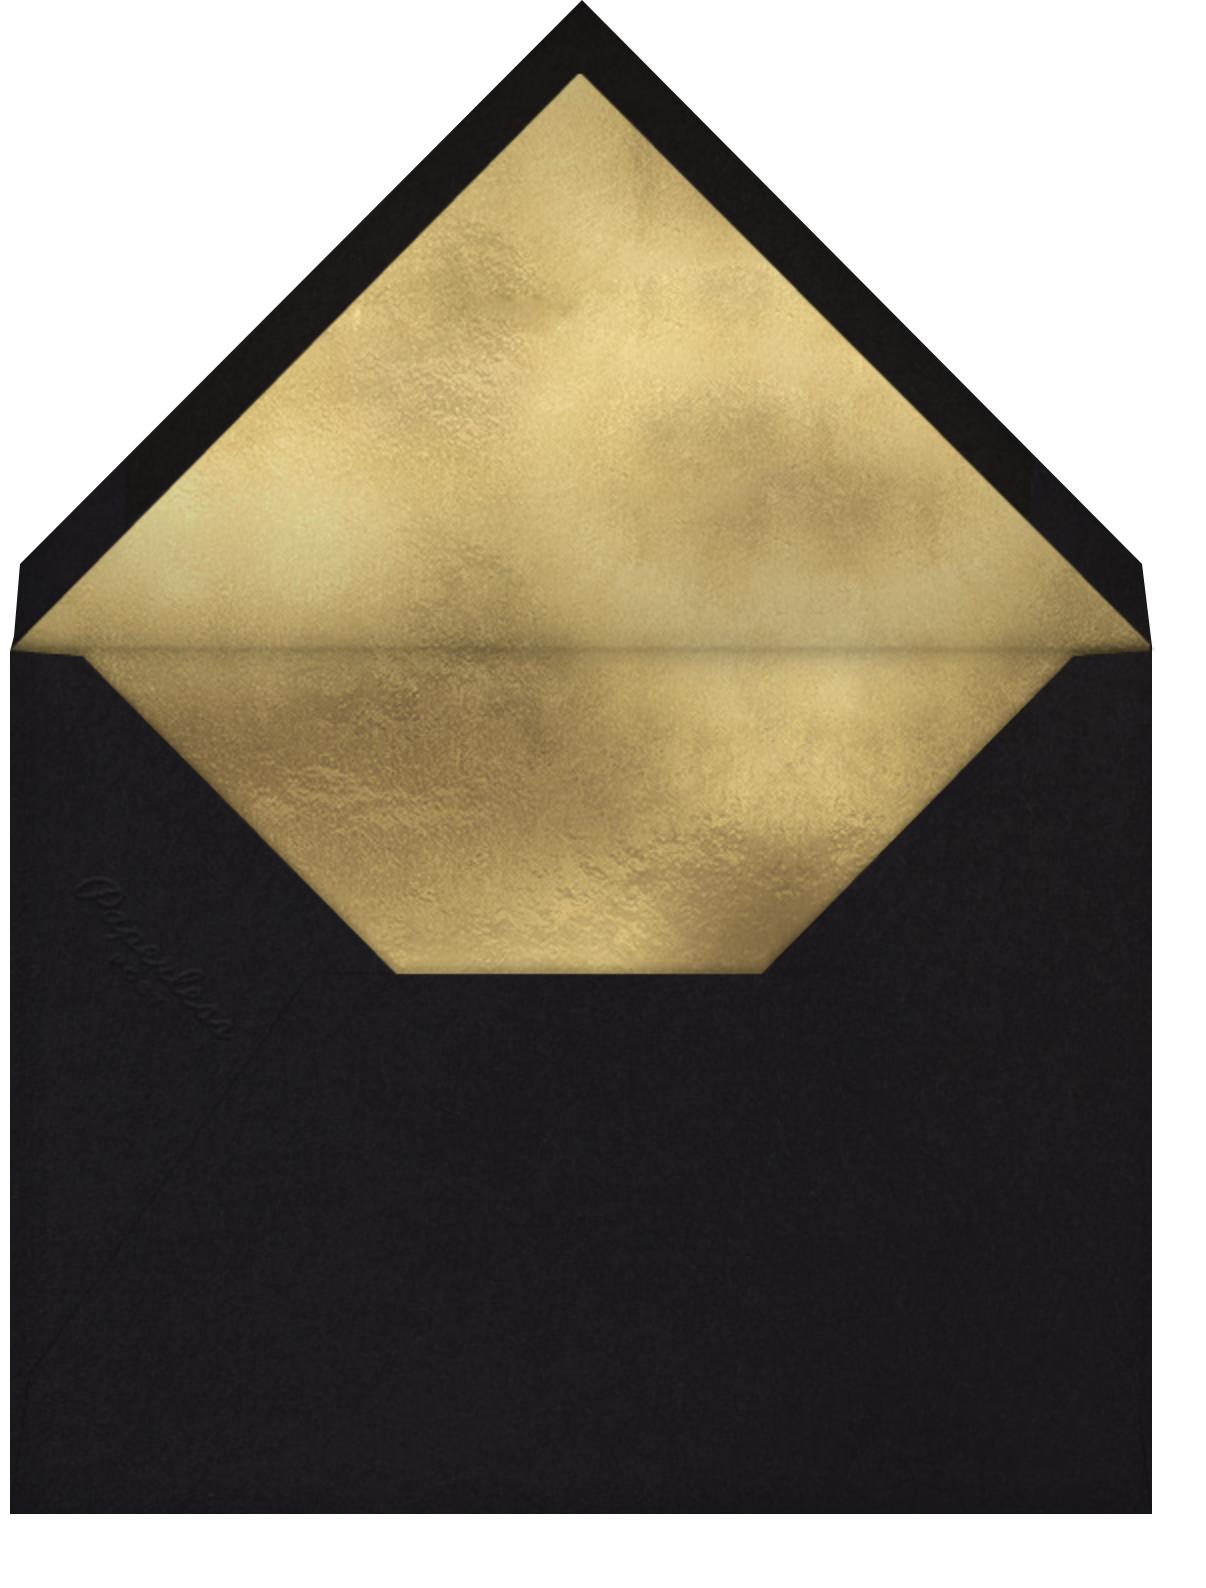 Neve - Black - Kelly Wearstler - Engagement party - envelope back